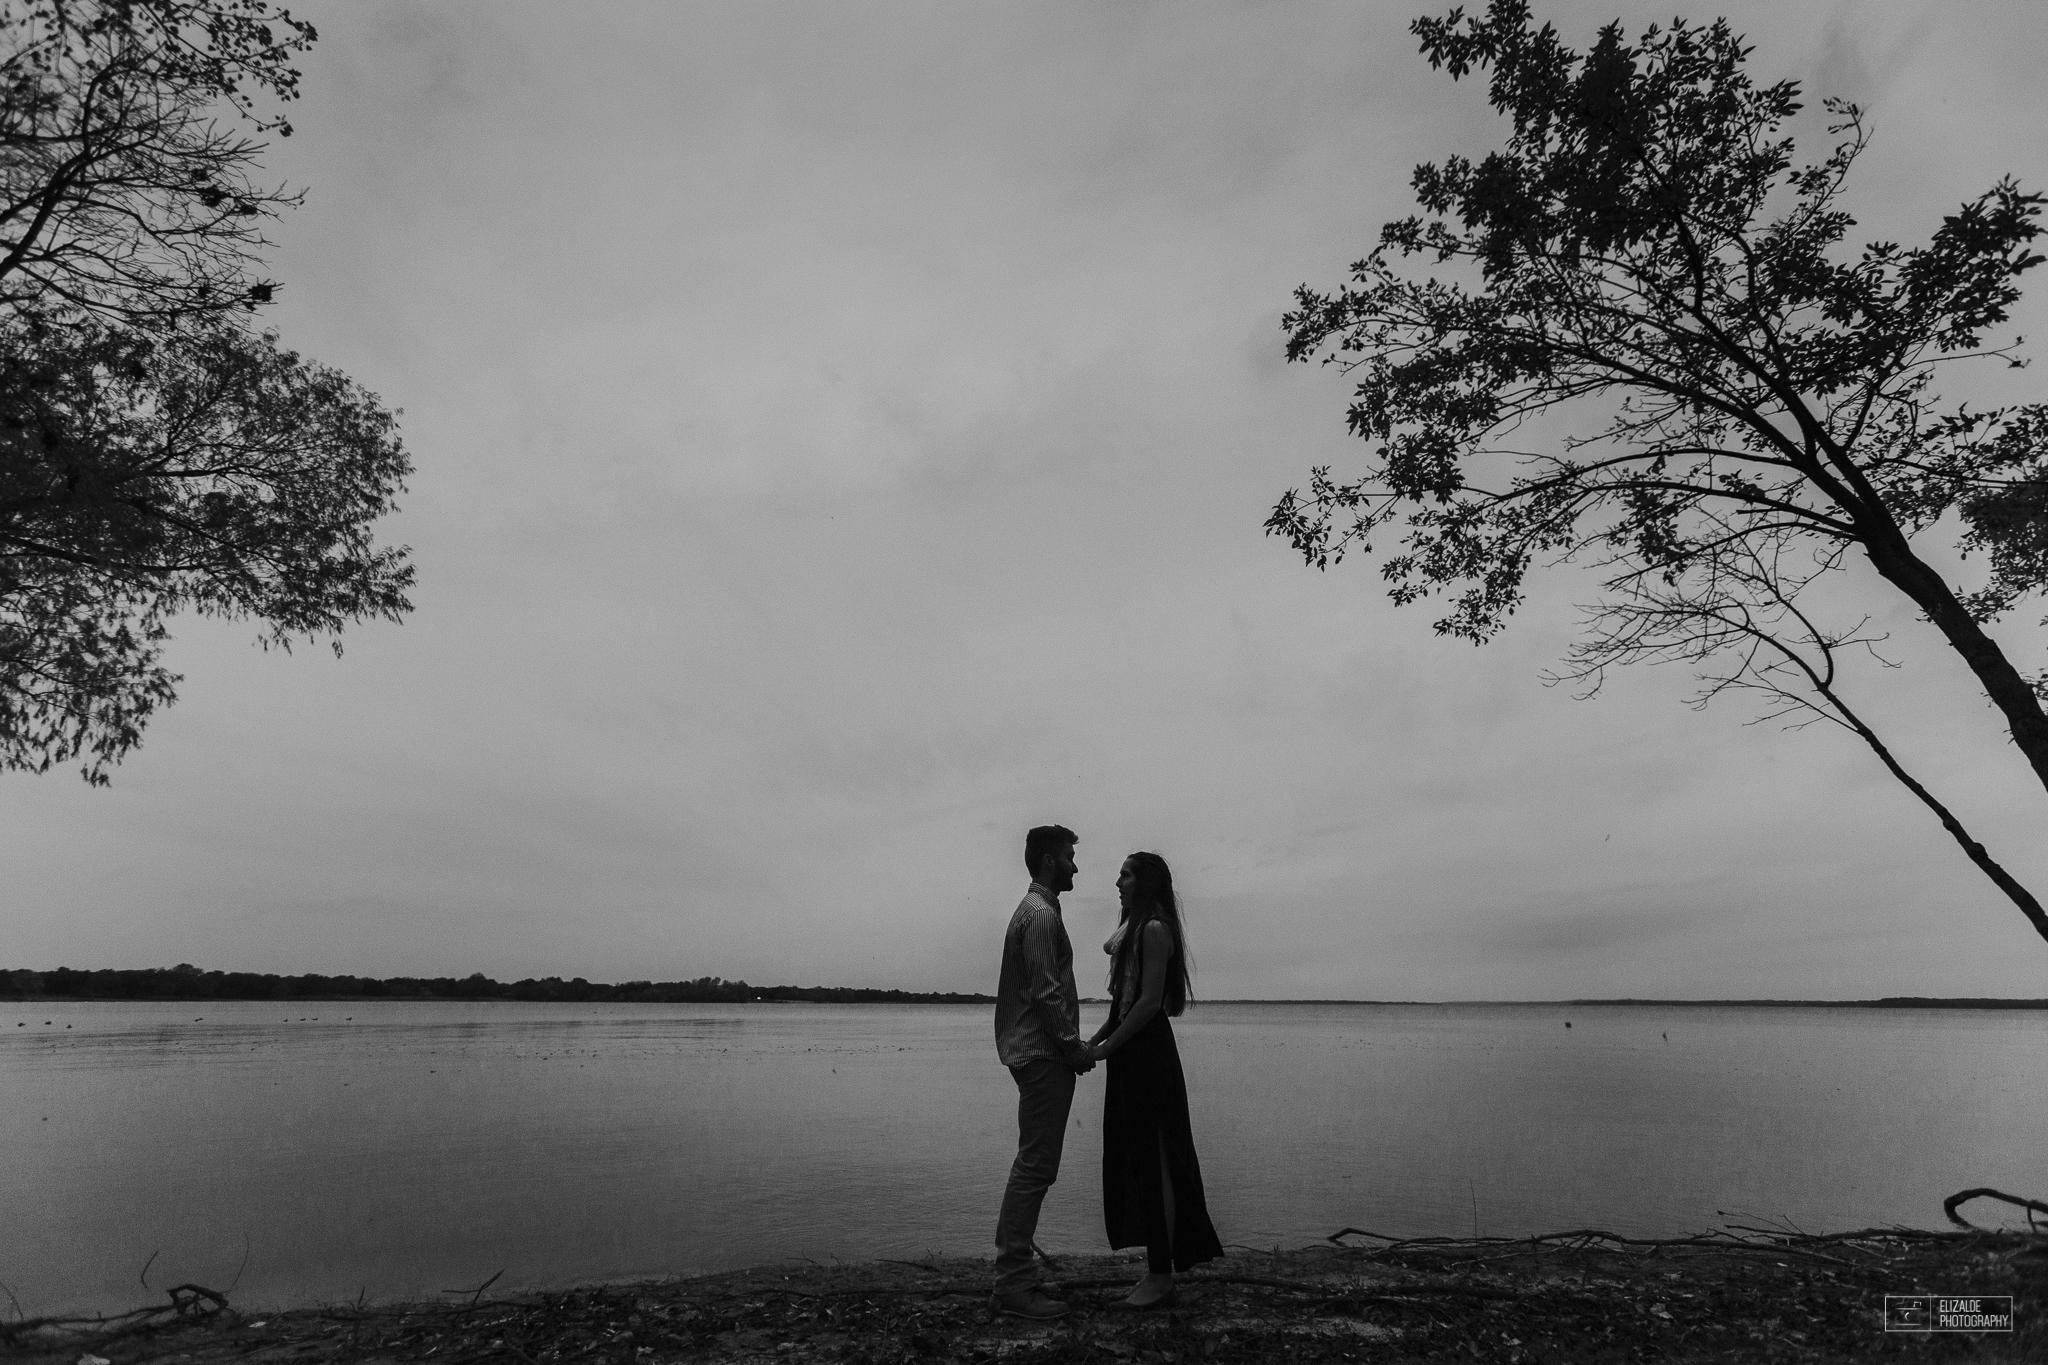 Engagement session_Engagement_Dallas photographer_Denton Photographer_elizalde photography_DFW wedding photographer_wedding (10 of 24).jpg